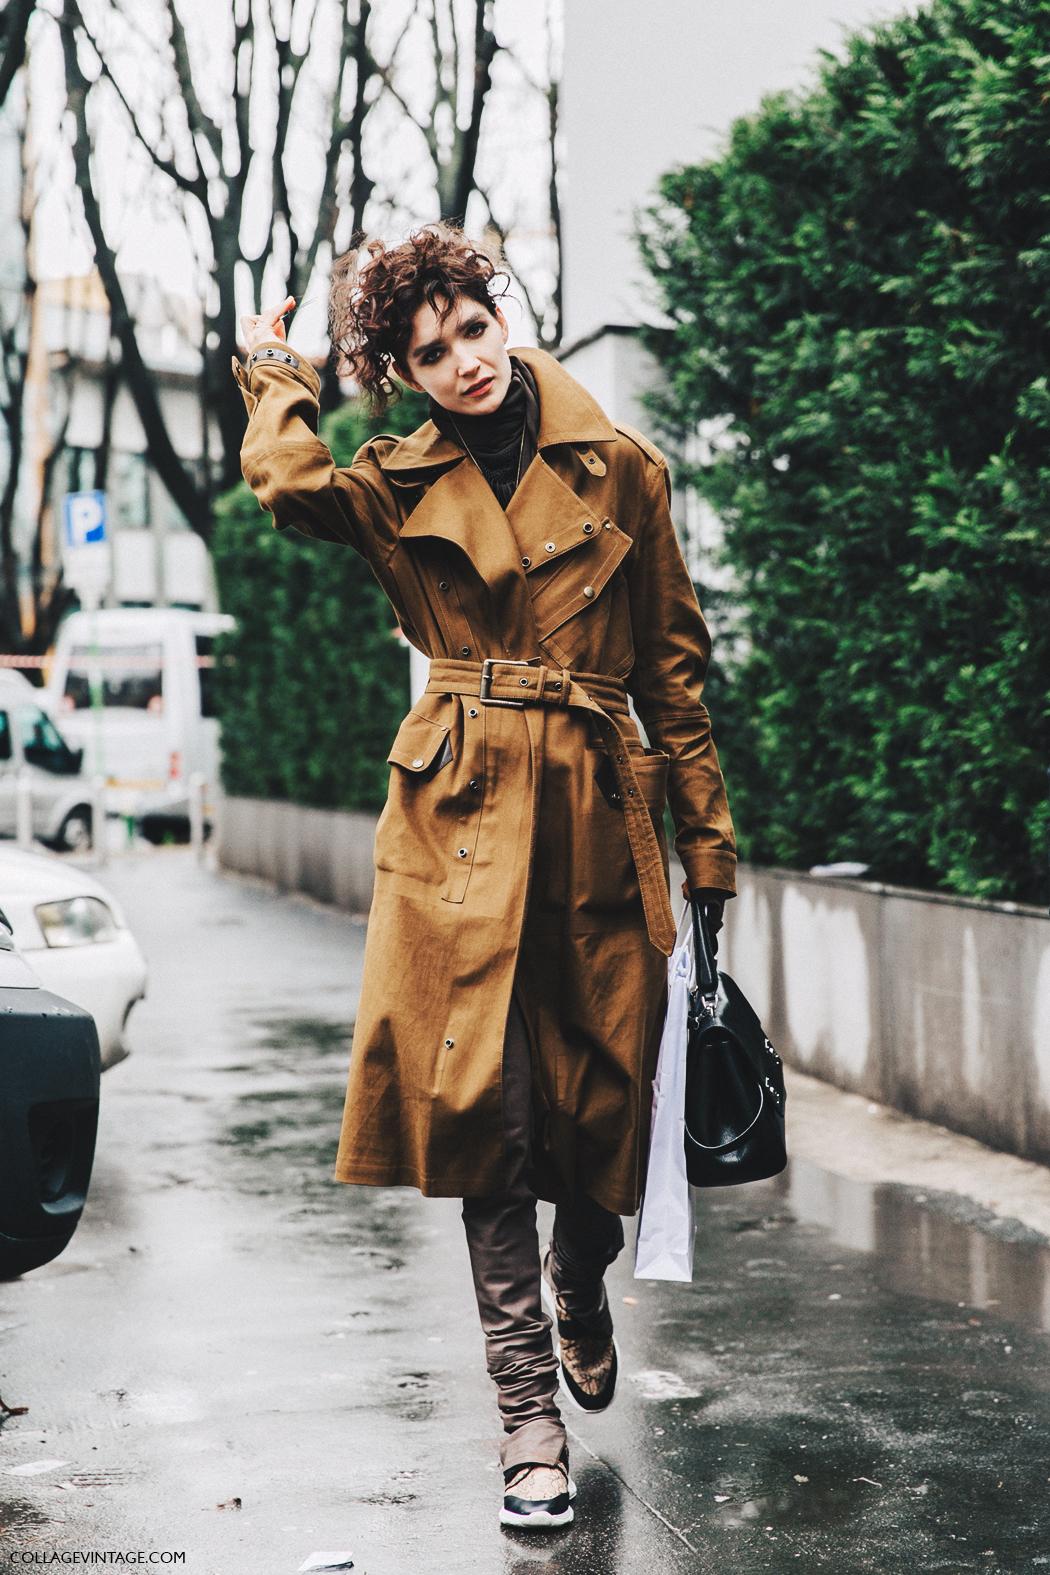 Milan_Fashion_Week_Fall_16-MFW-Street_Style-Collage_Vintage-Trench_Coat-Armani-Model-